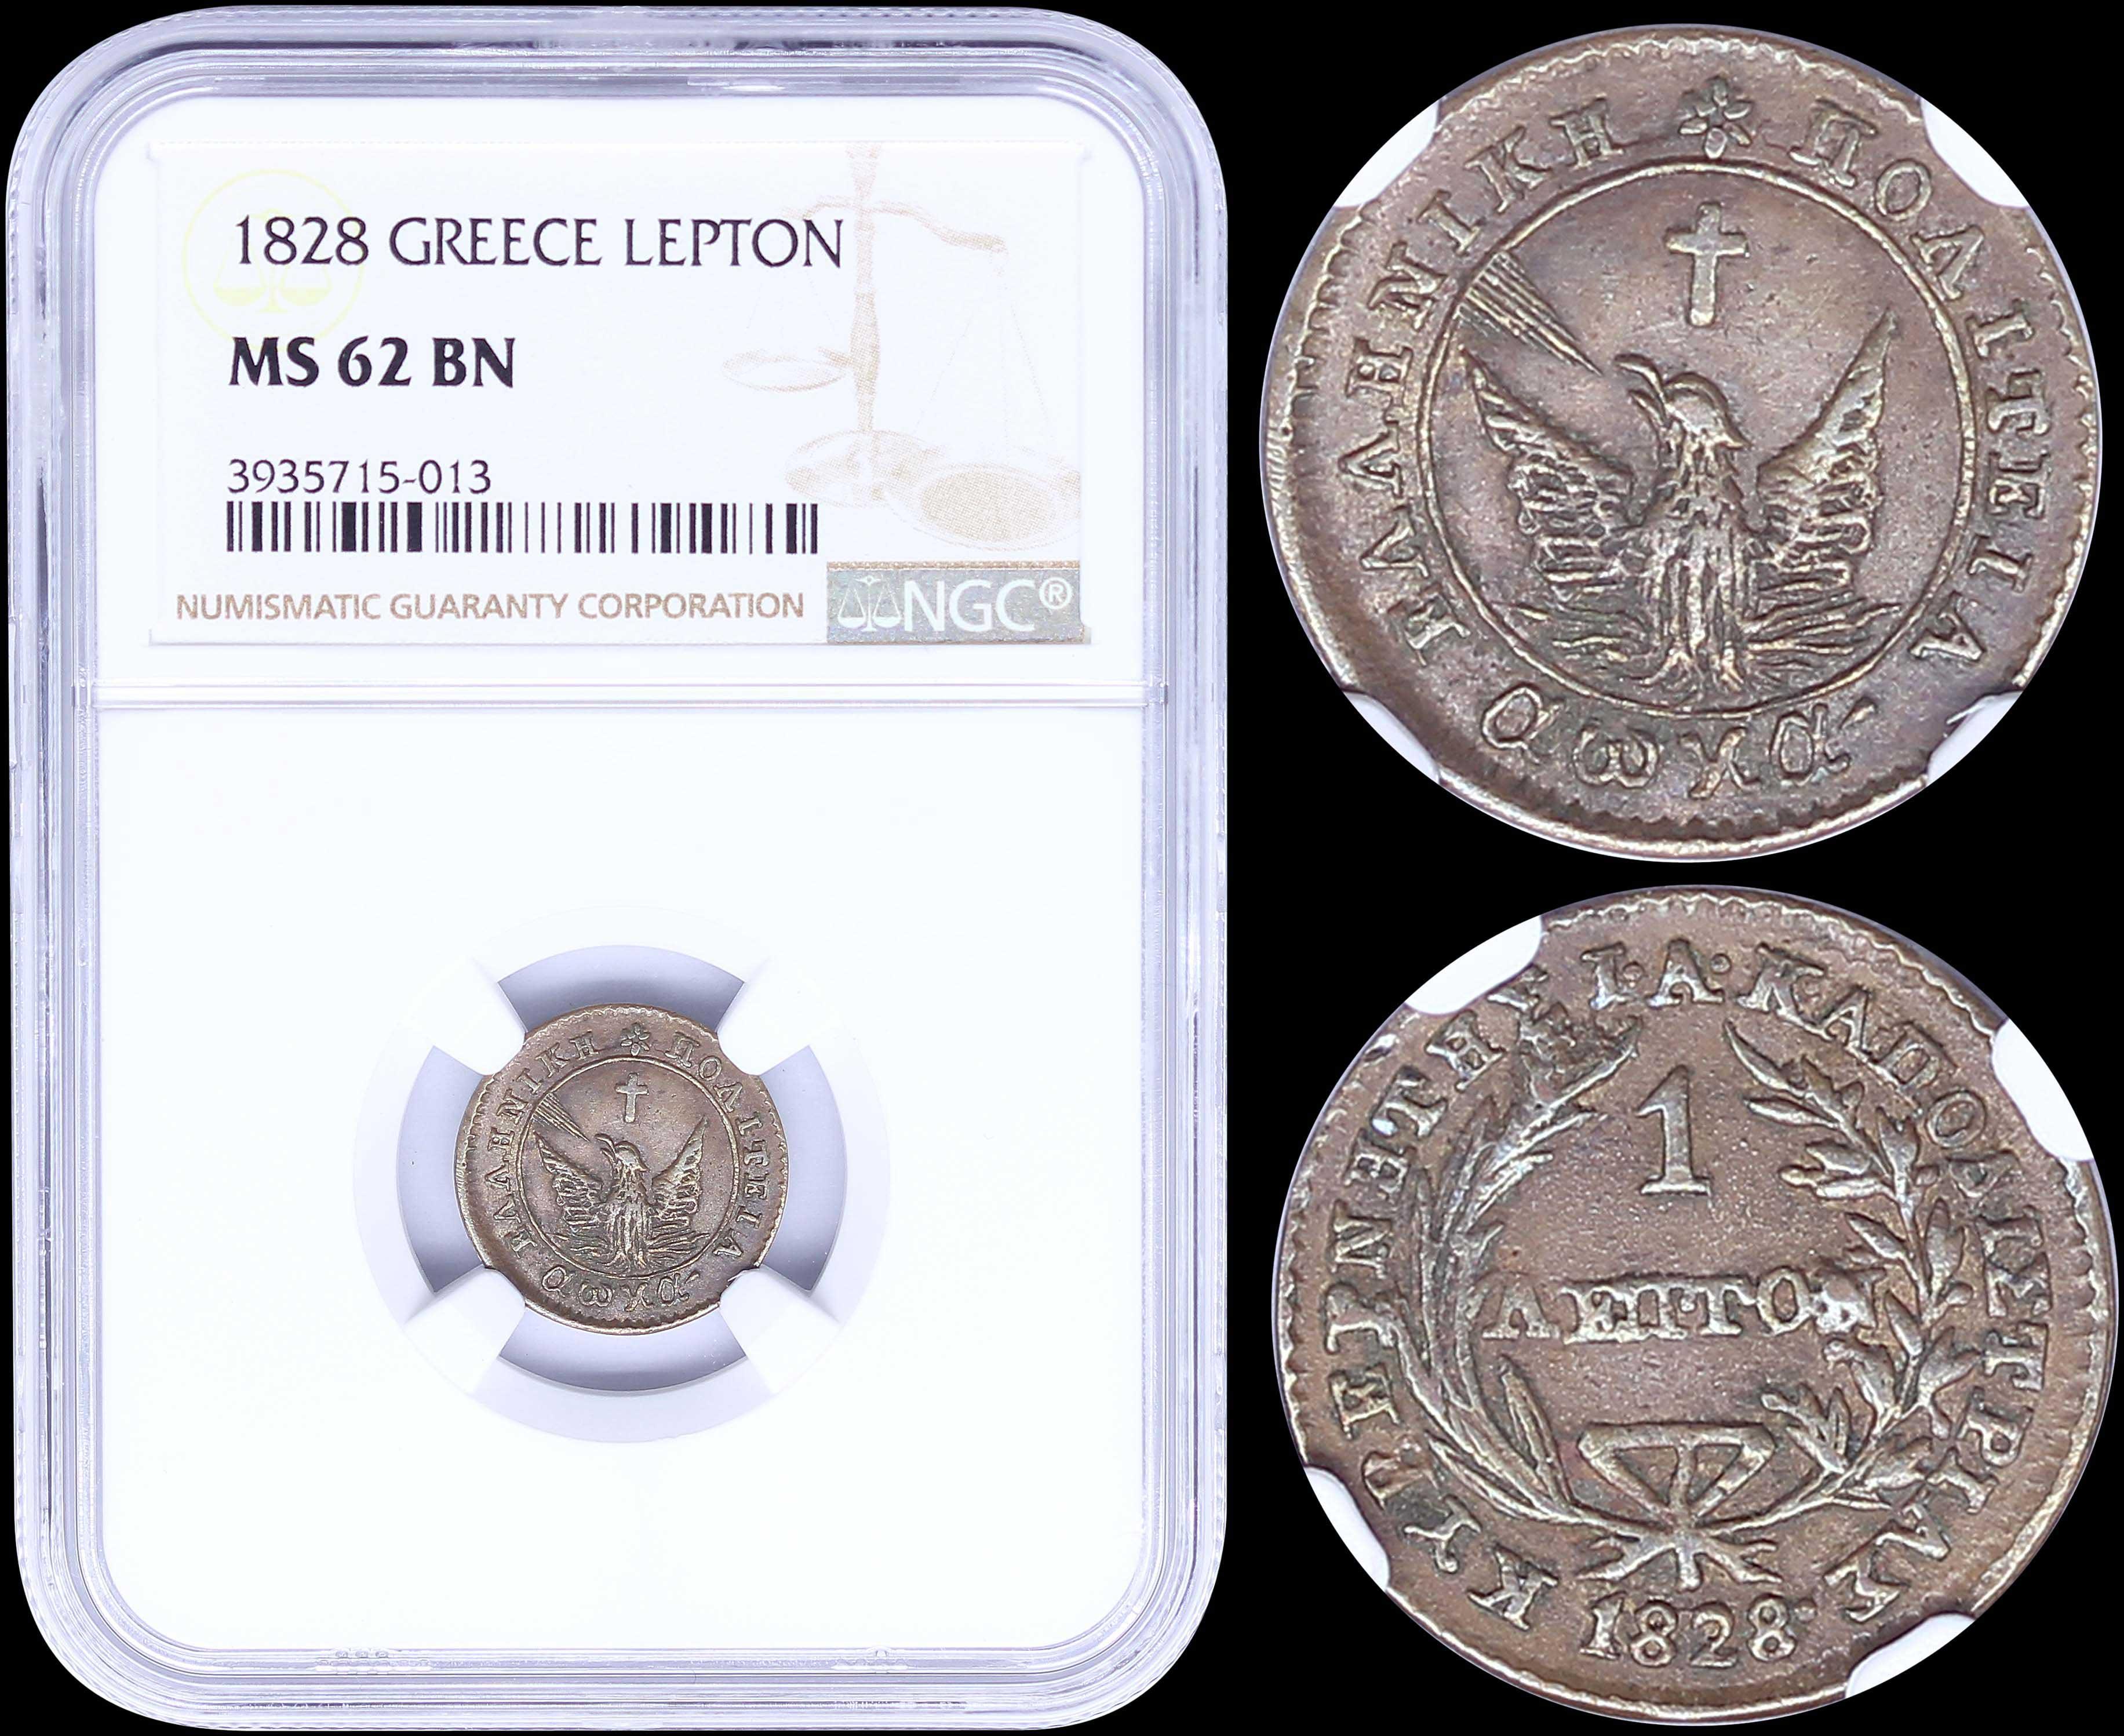 Lot 6004 - -  COINS & TOKENS governor capodistrias -  A. Karamitsos Public & Live Internet Auction 665 Coins, Medals & Banknotes